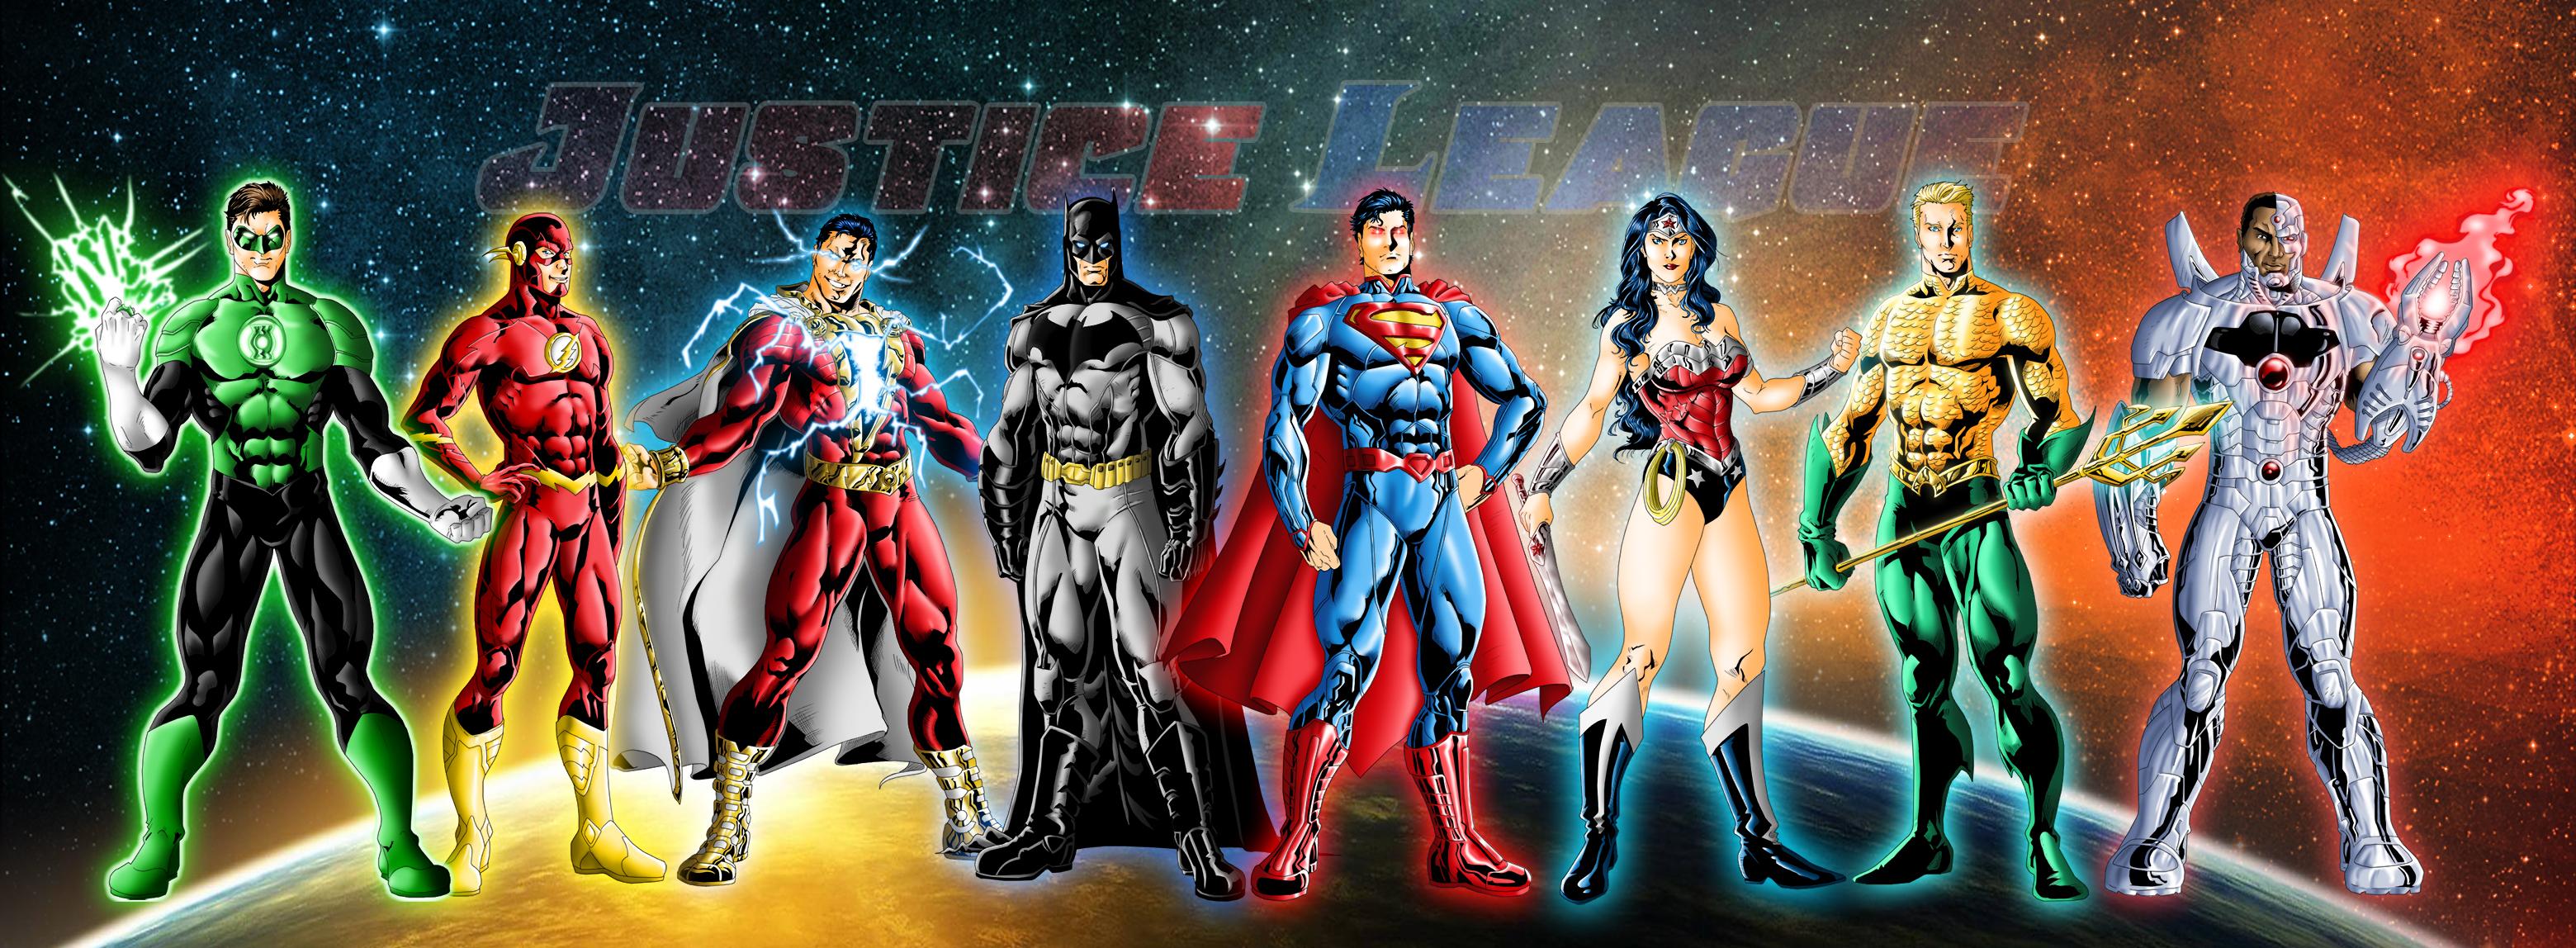 Justice League Computer Wallpapers Desktop Backgrounds 3120x1148